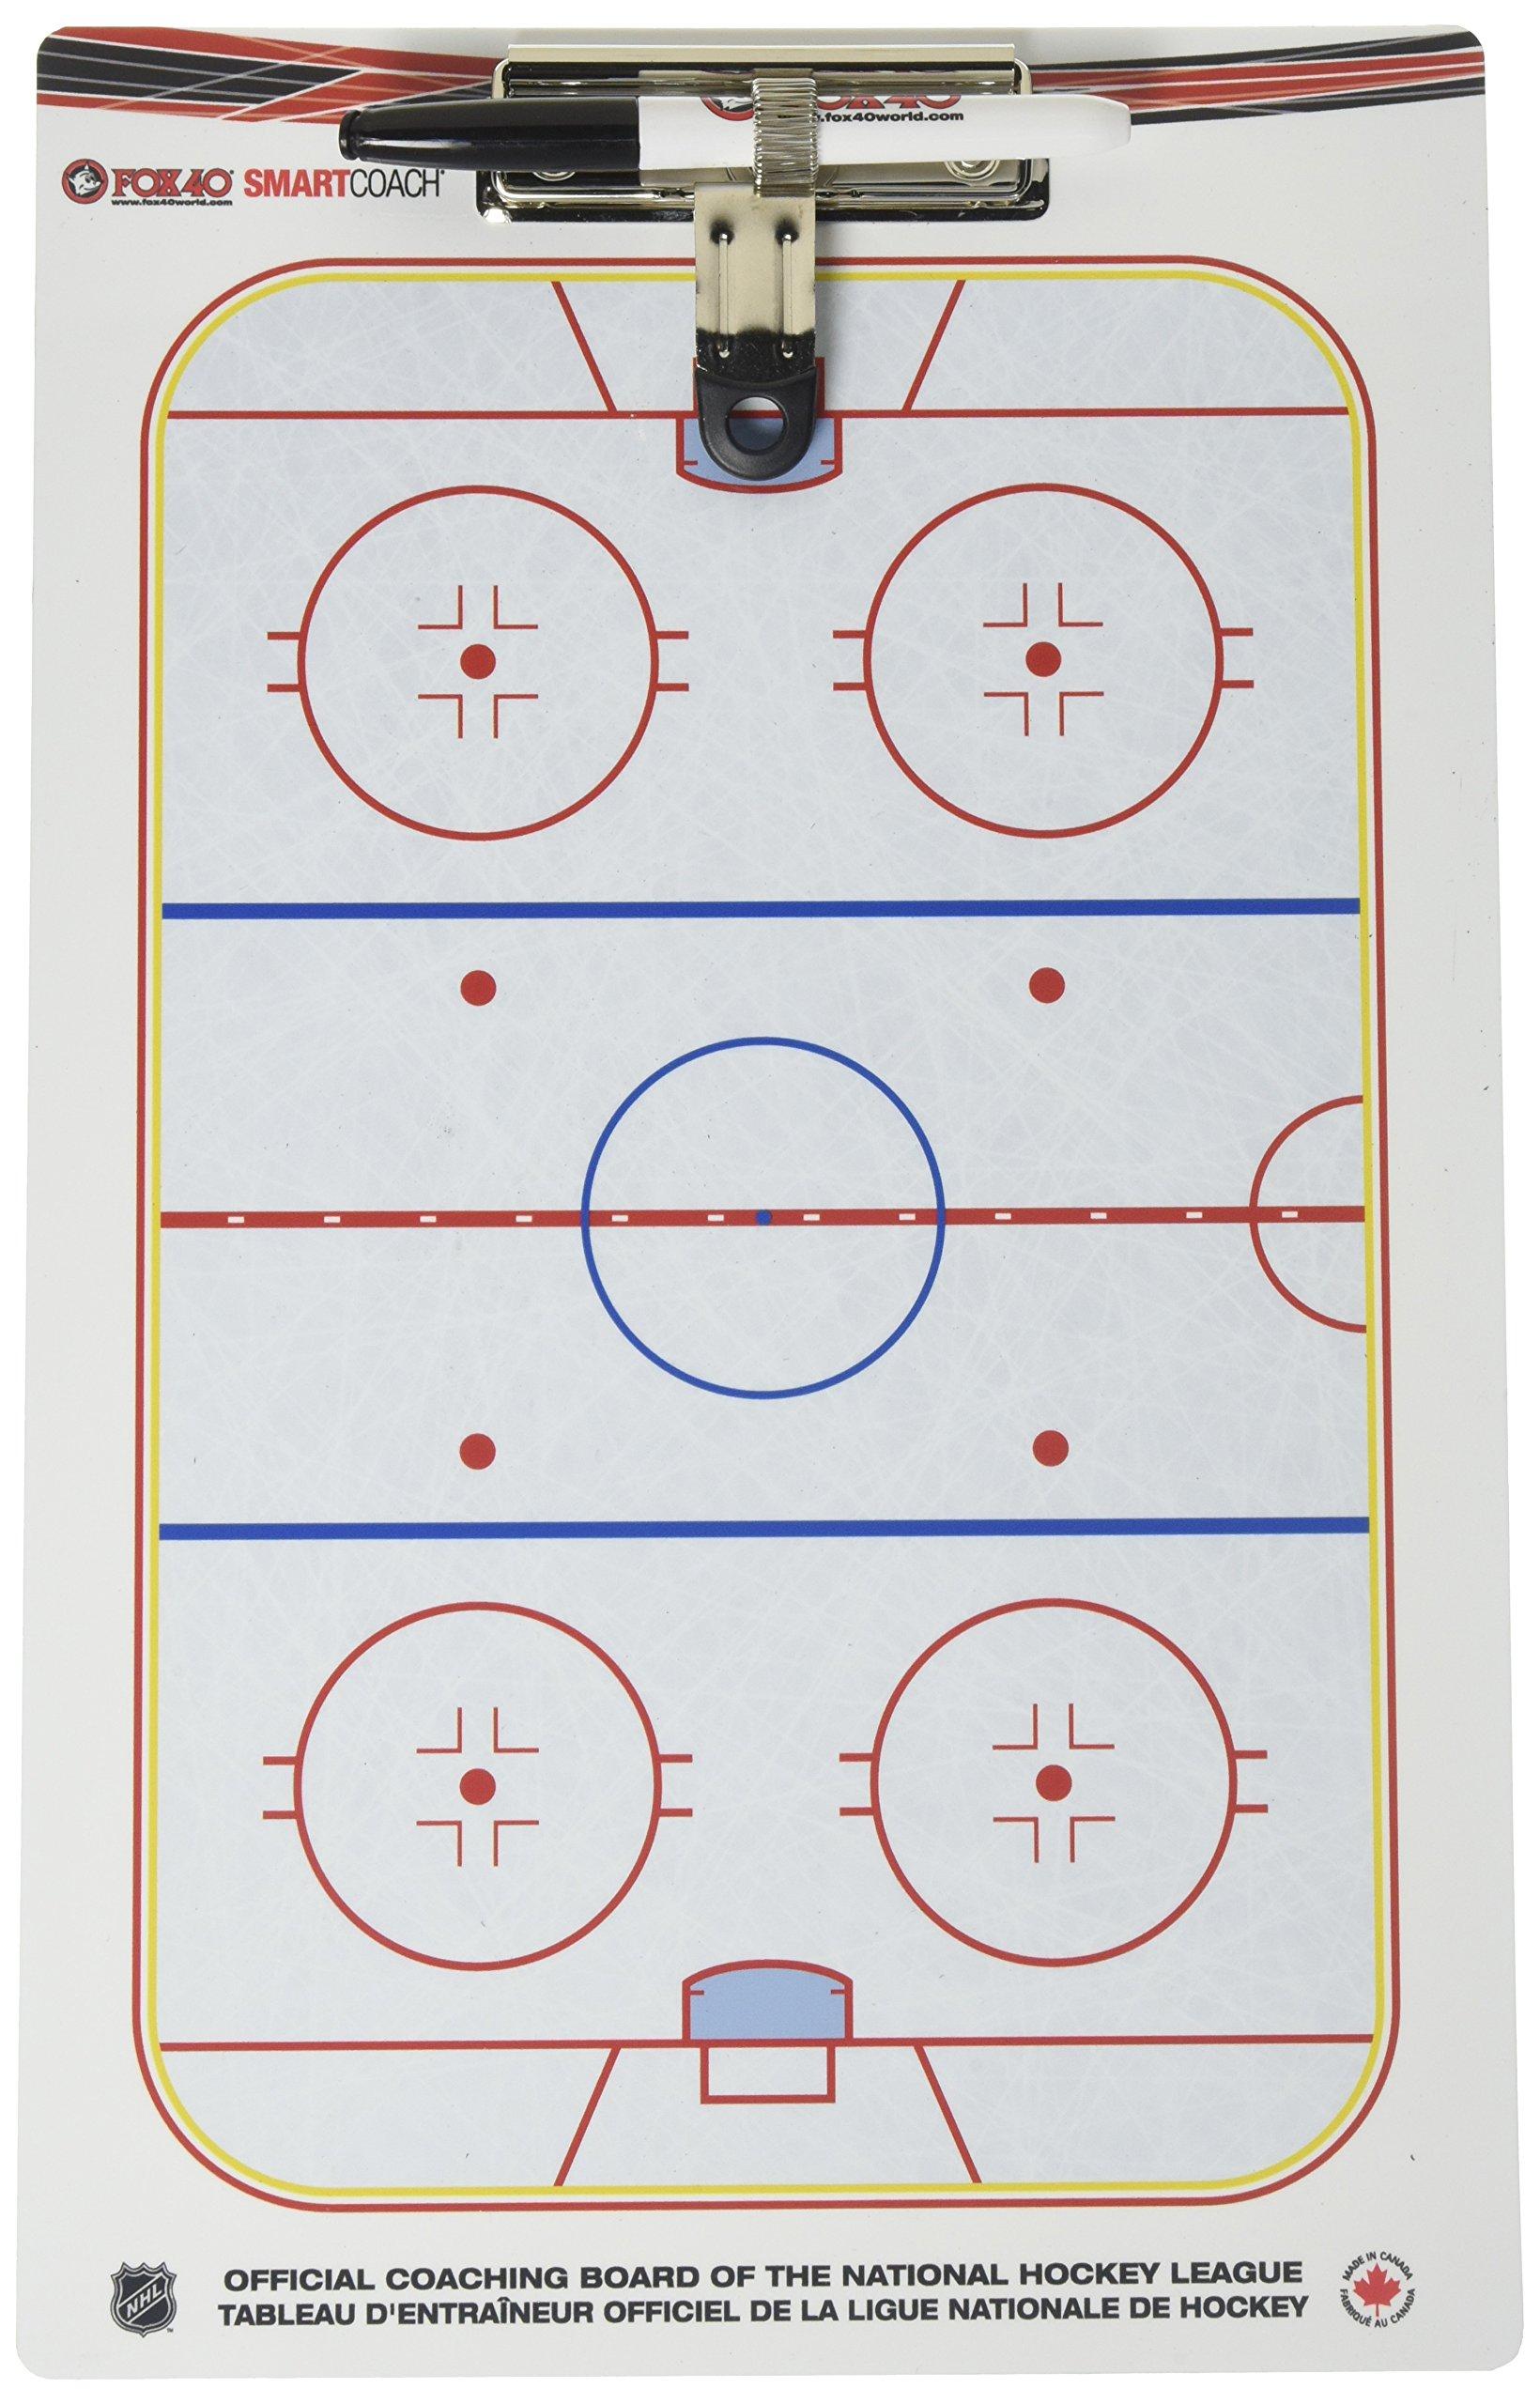 SmartCoach Pro Clipboard - Ice Hockey